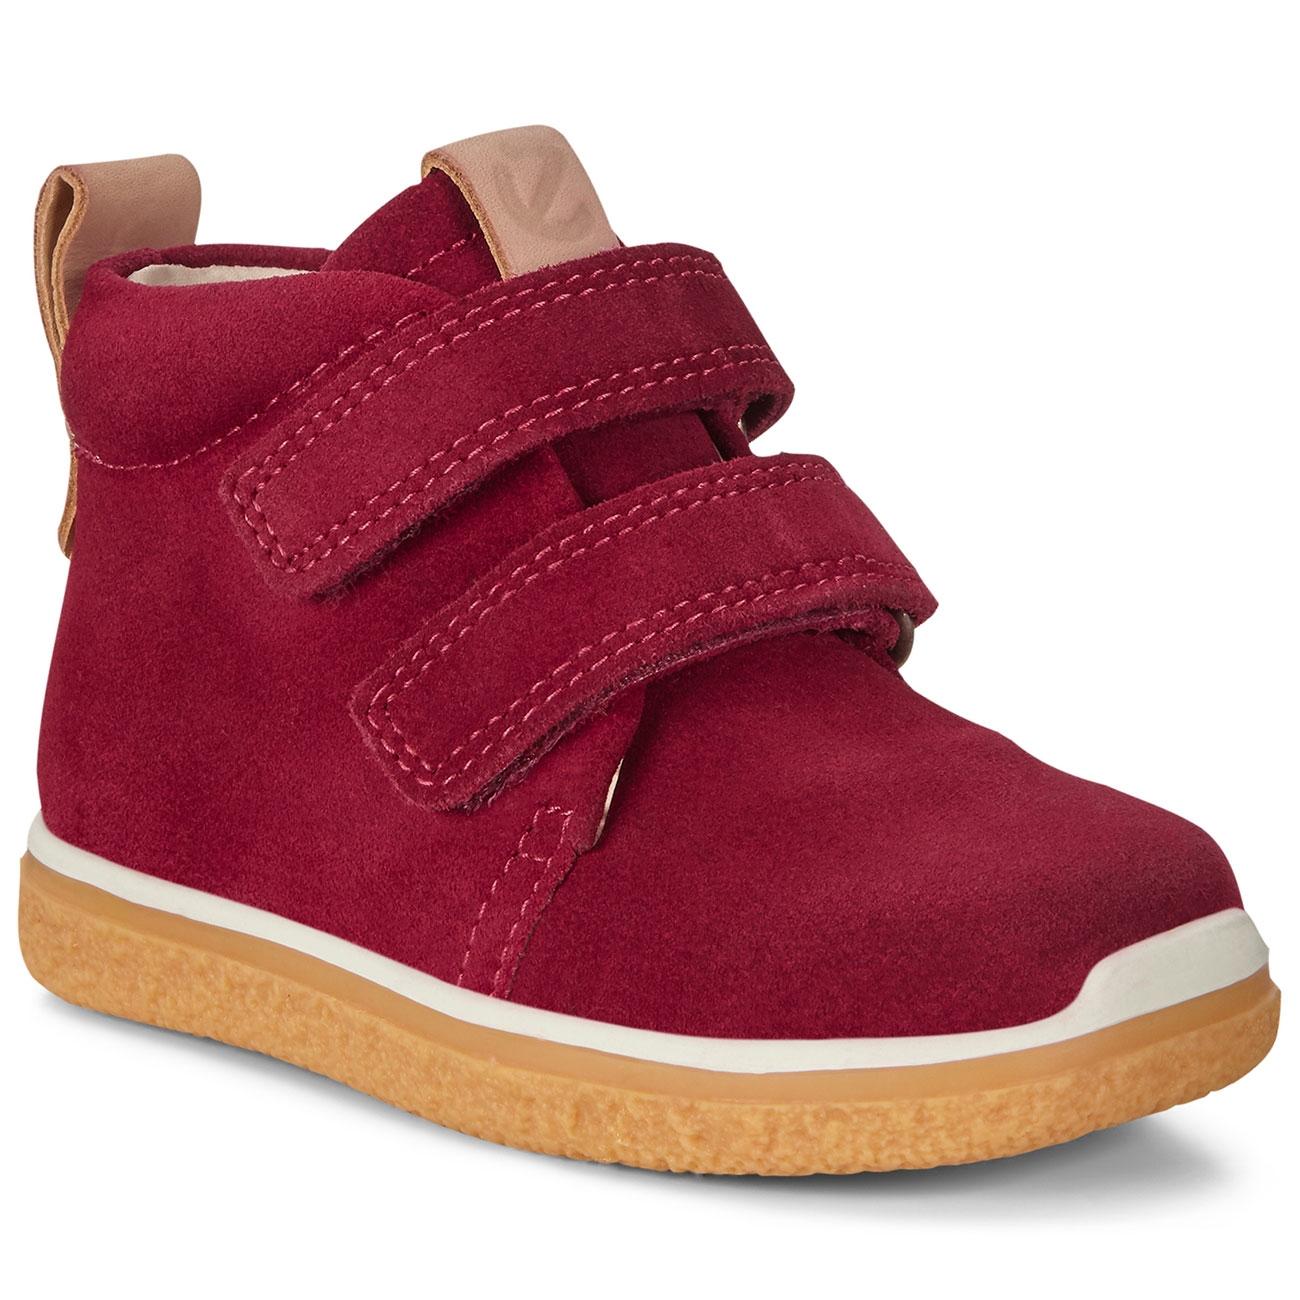 Ecco Cepretray Mini Suede Shoes Red Plum